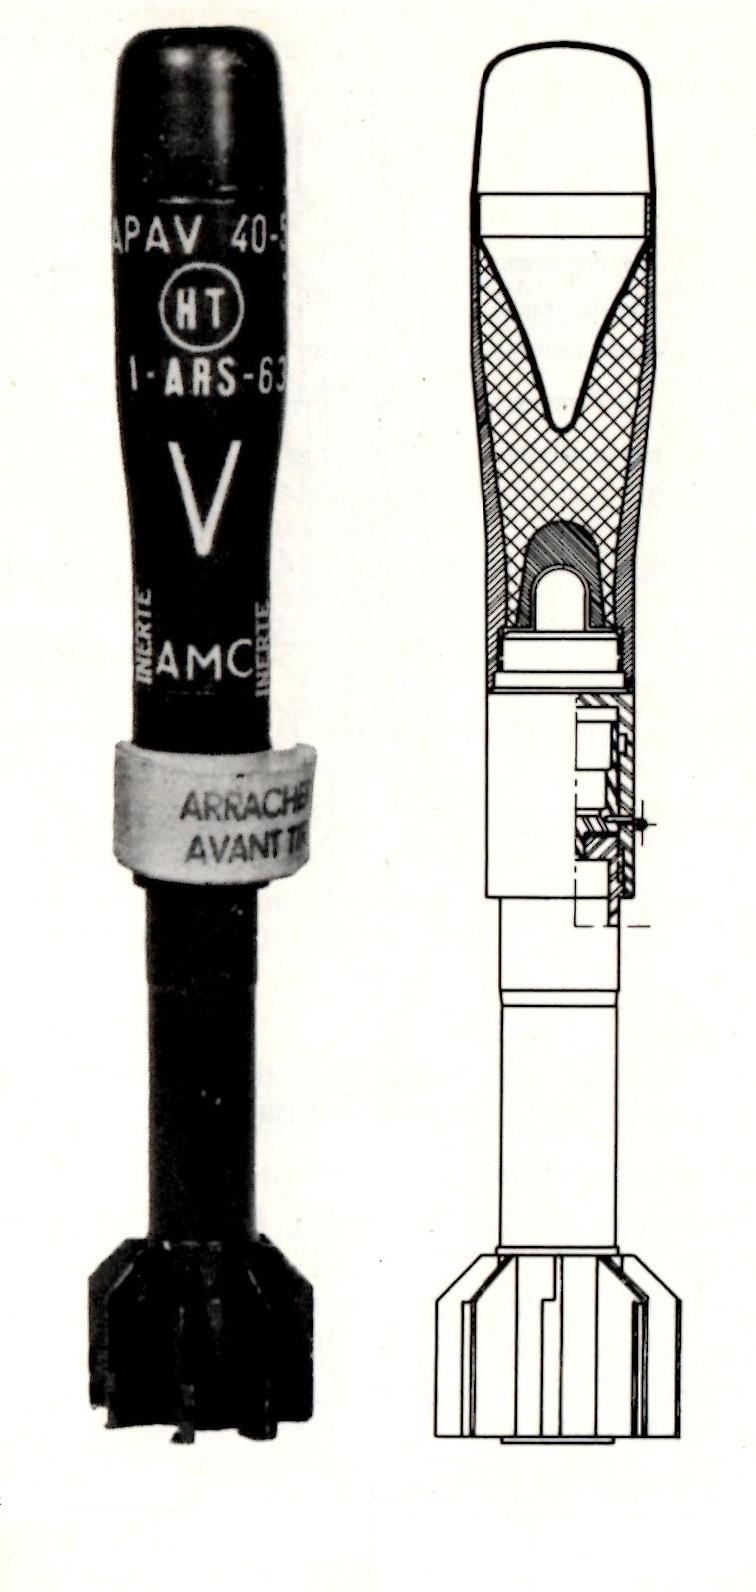 Gr ap av 40 mm m56 schema